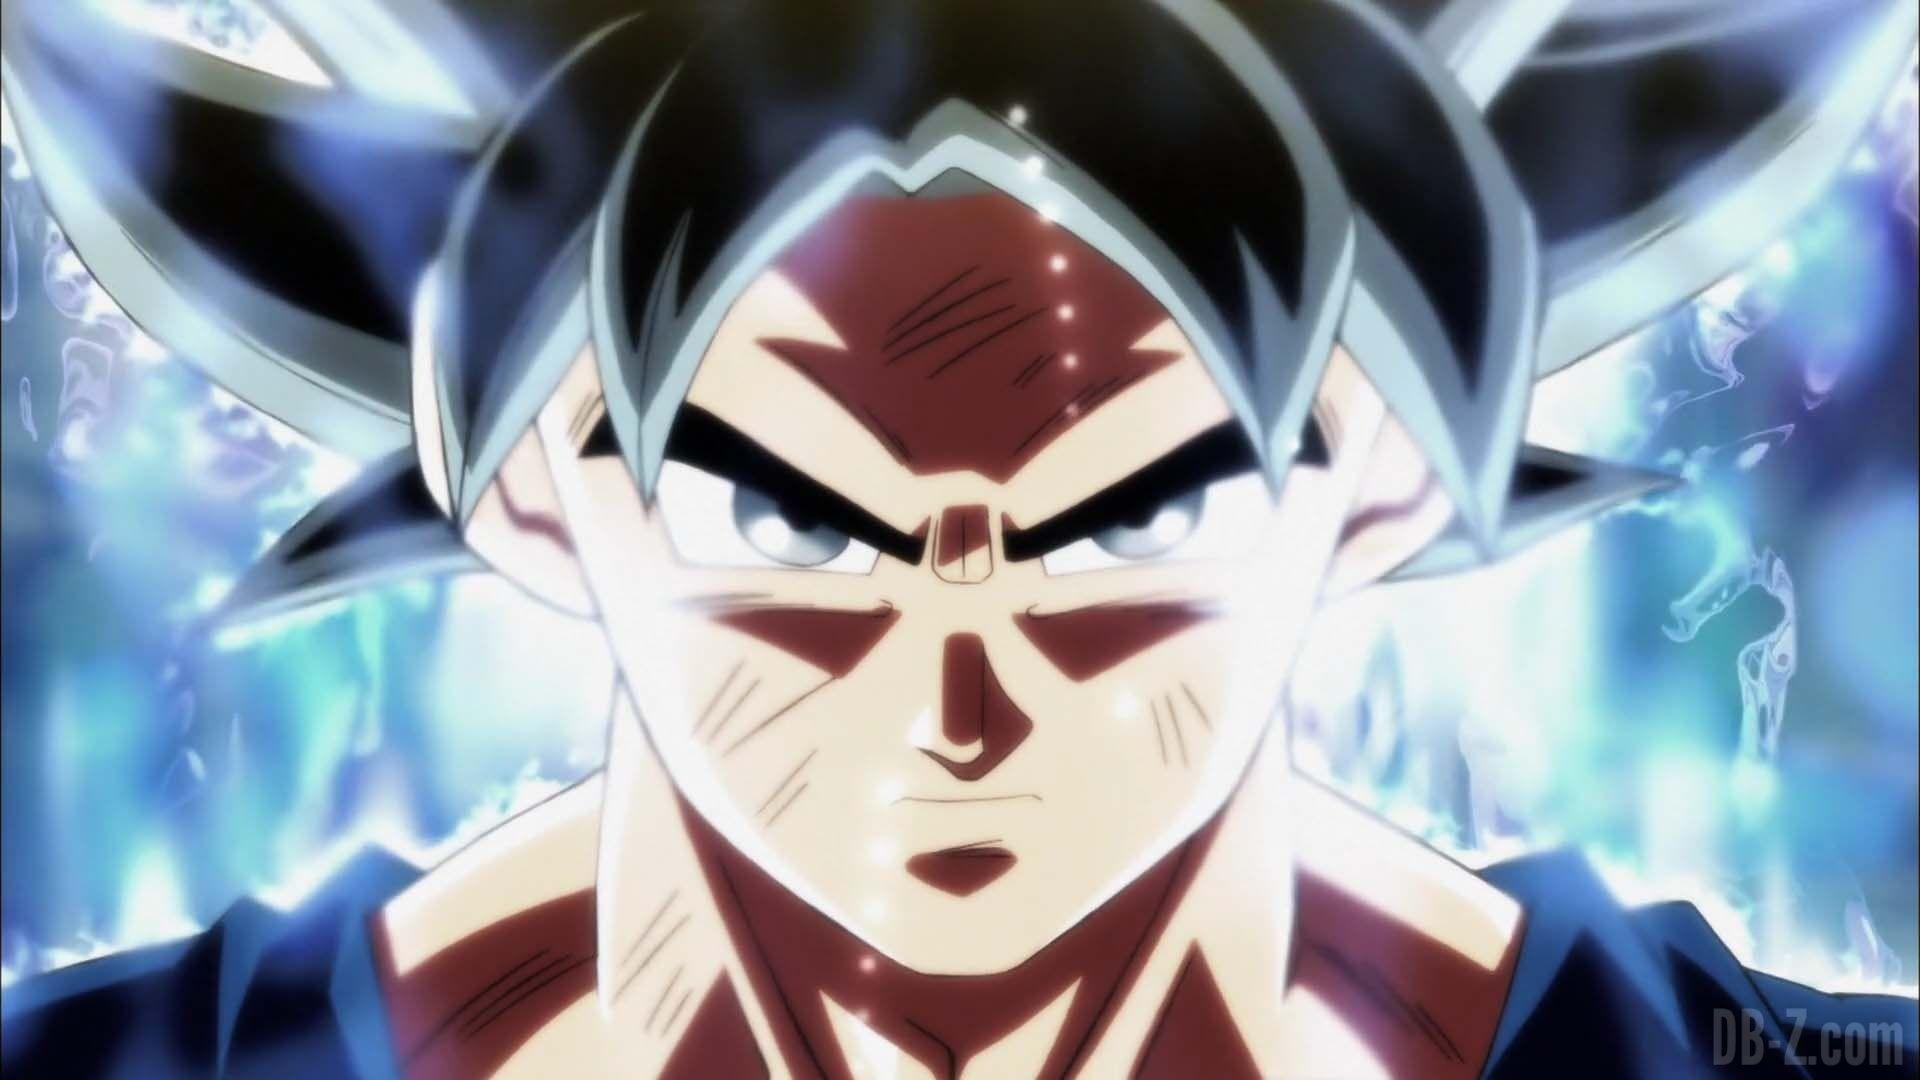 Goku Ultra Instinto Fondos De Pantalla Wallpaper: Goku Master Ultra Instinct Wallpapers